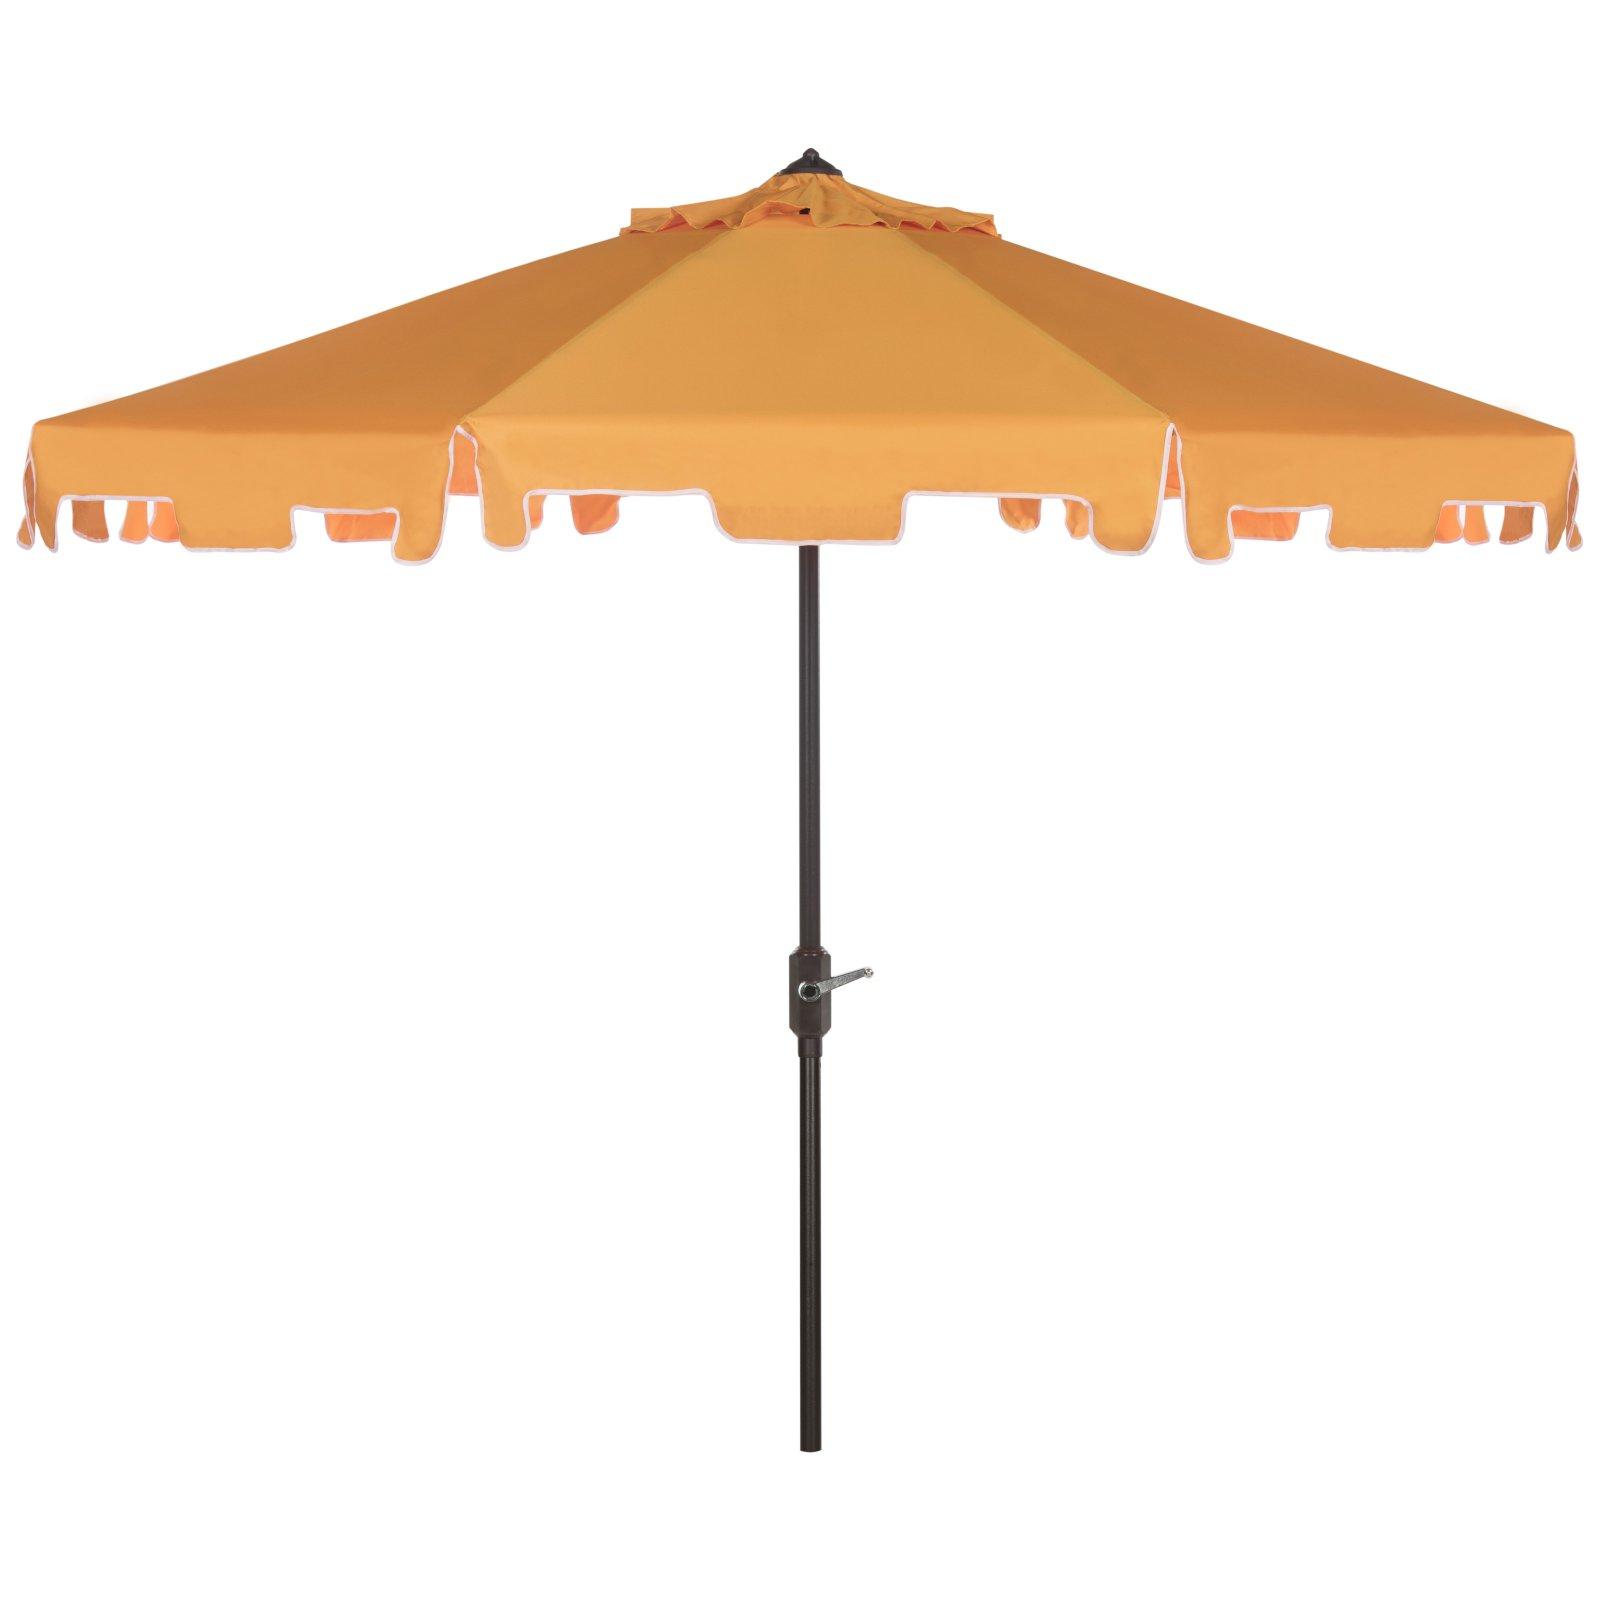 Safavieh Zimmerman Outdoor 9' Market Umbrella, Multiple Colors by Safavieh